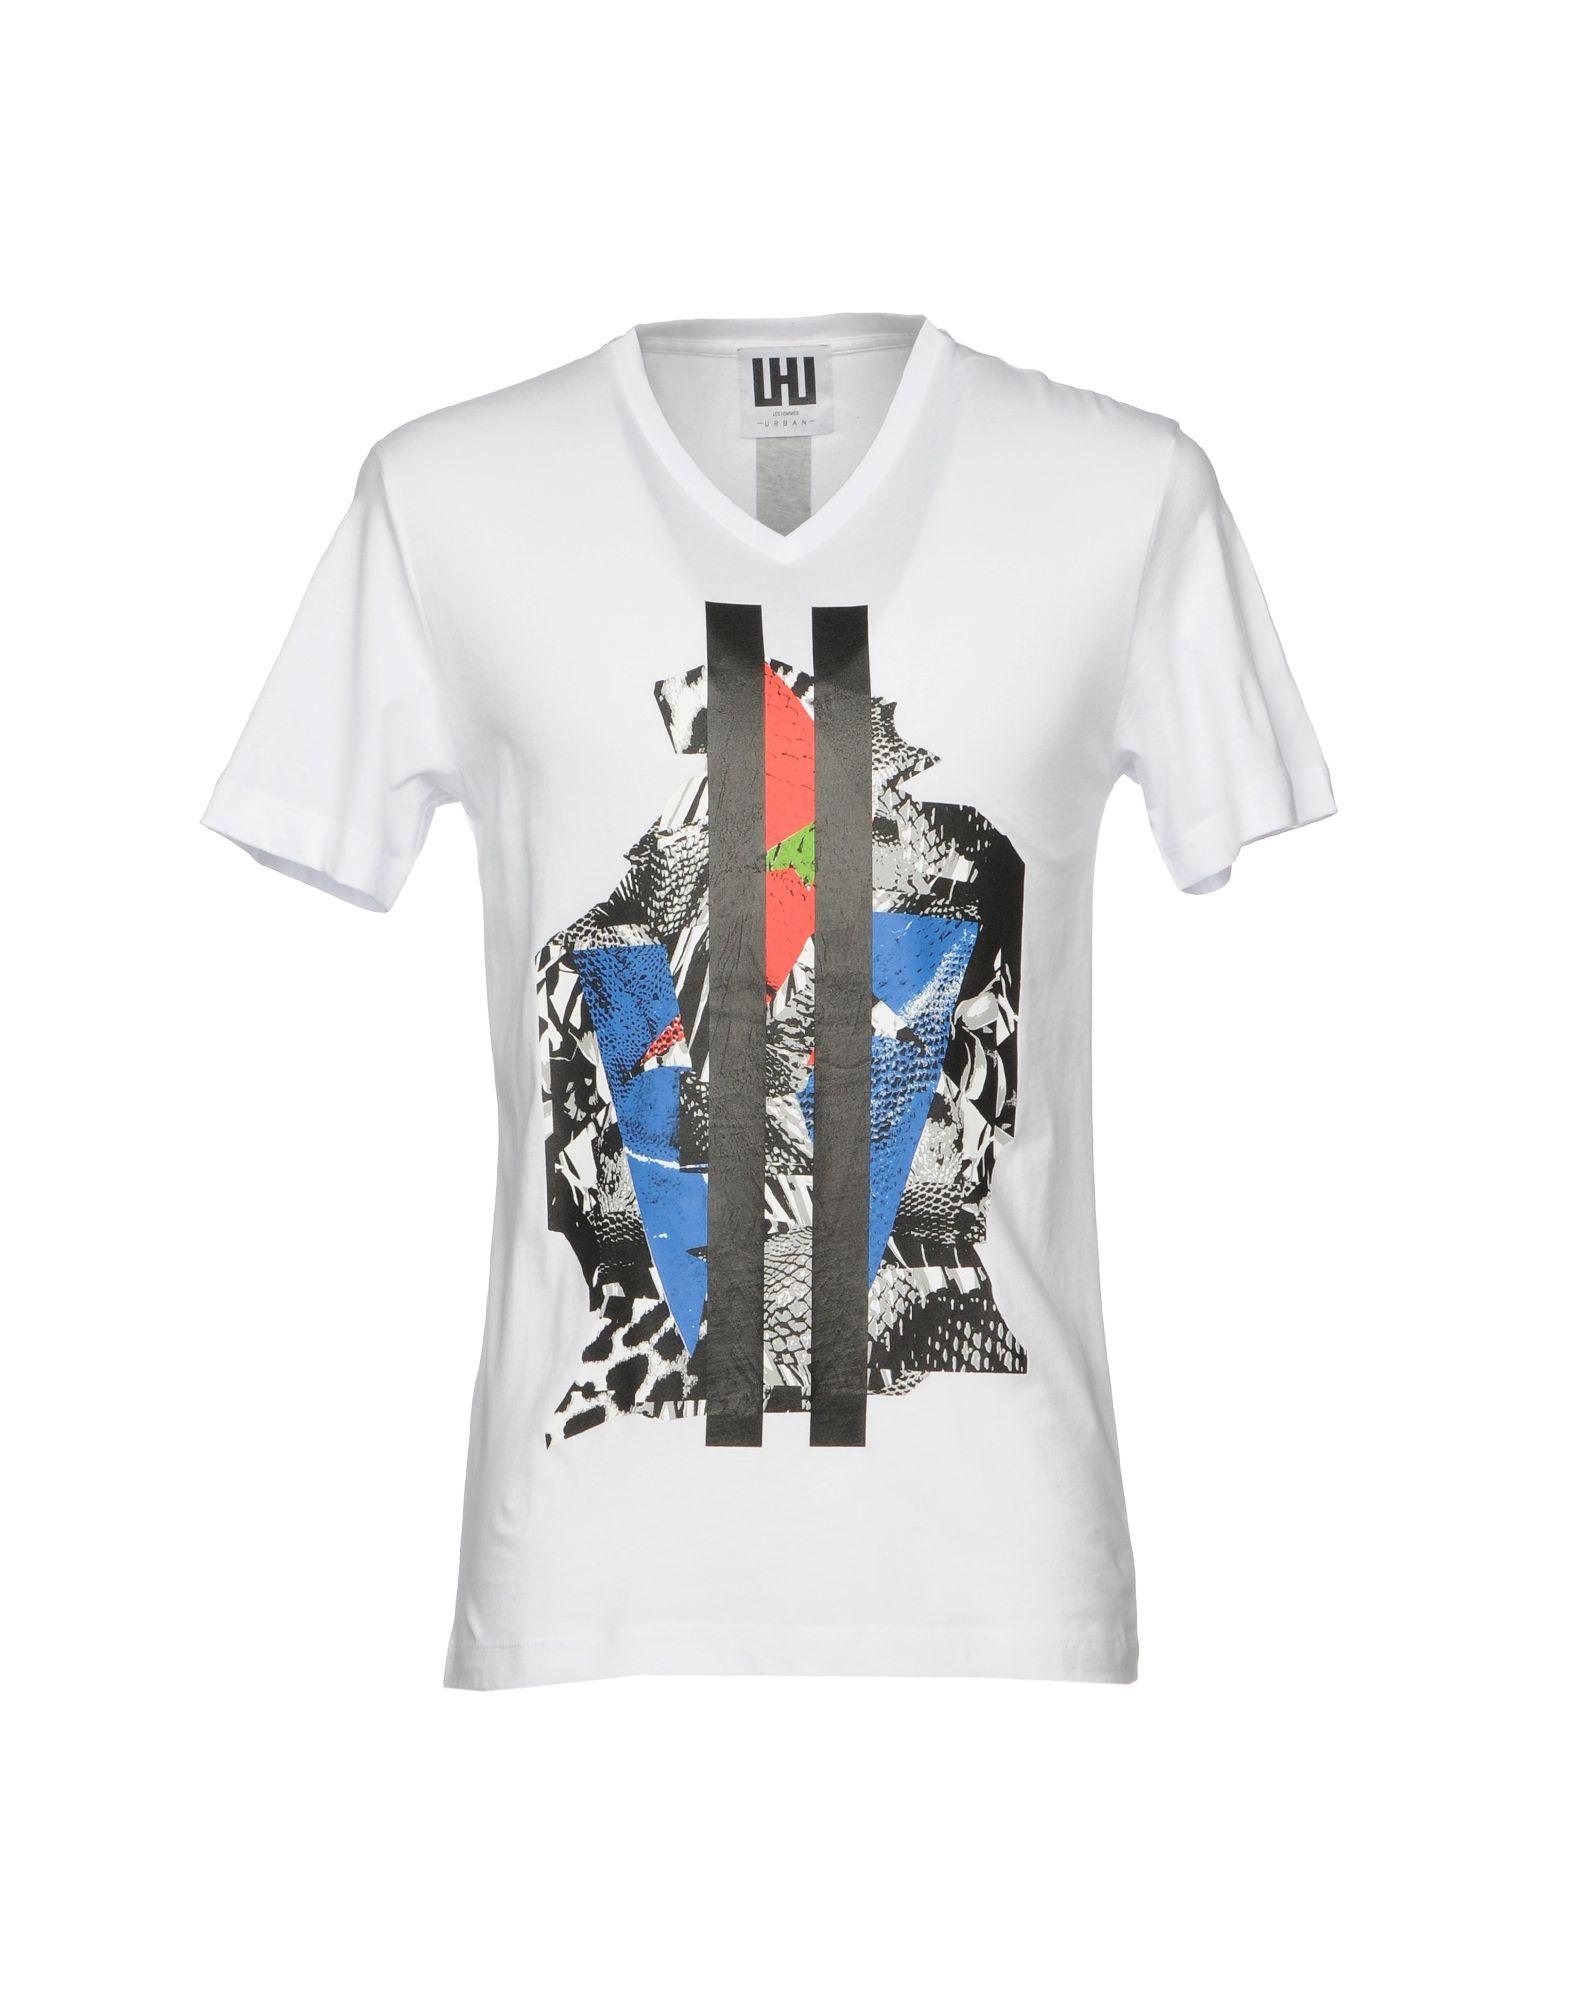 T-Shirt Urban Les Hommes Uomo Uomo Hommes - 12106147RL 06ae71